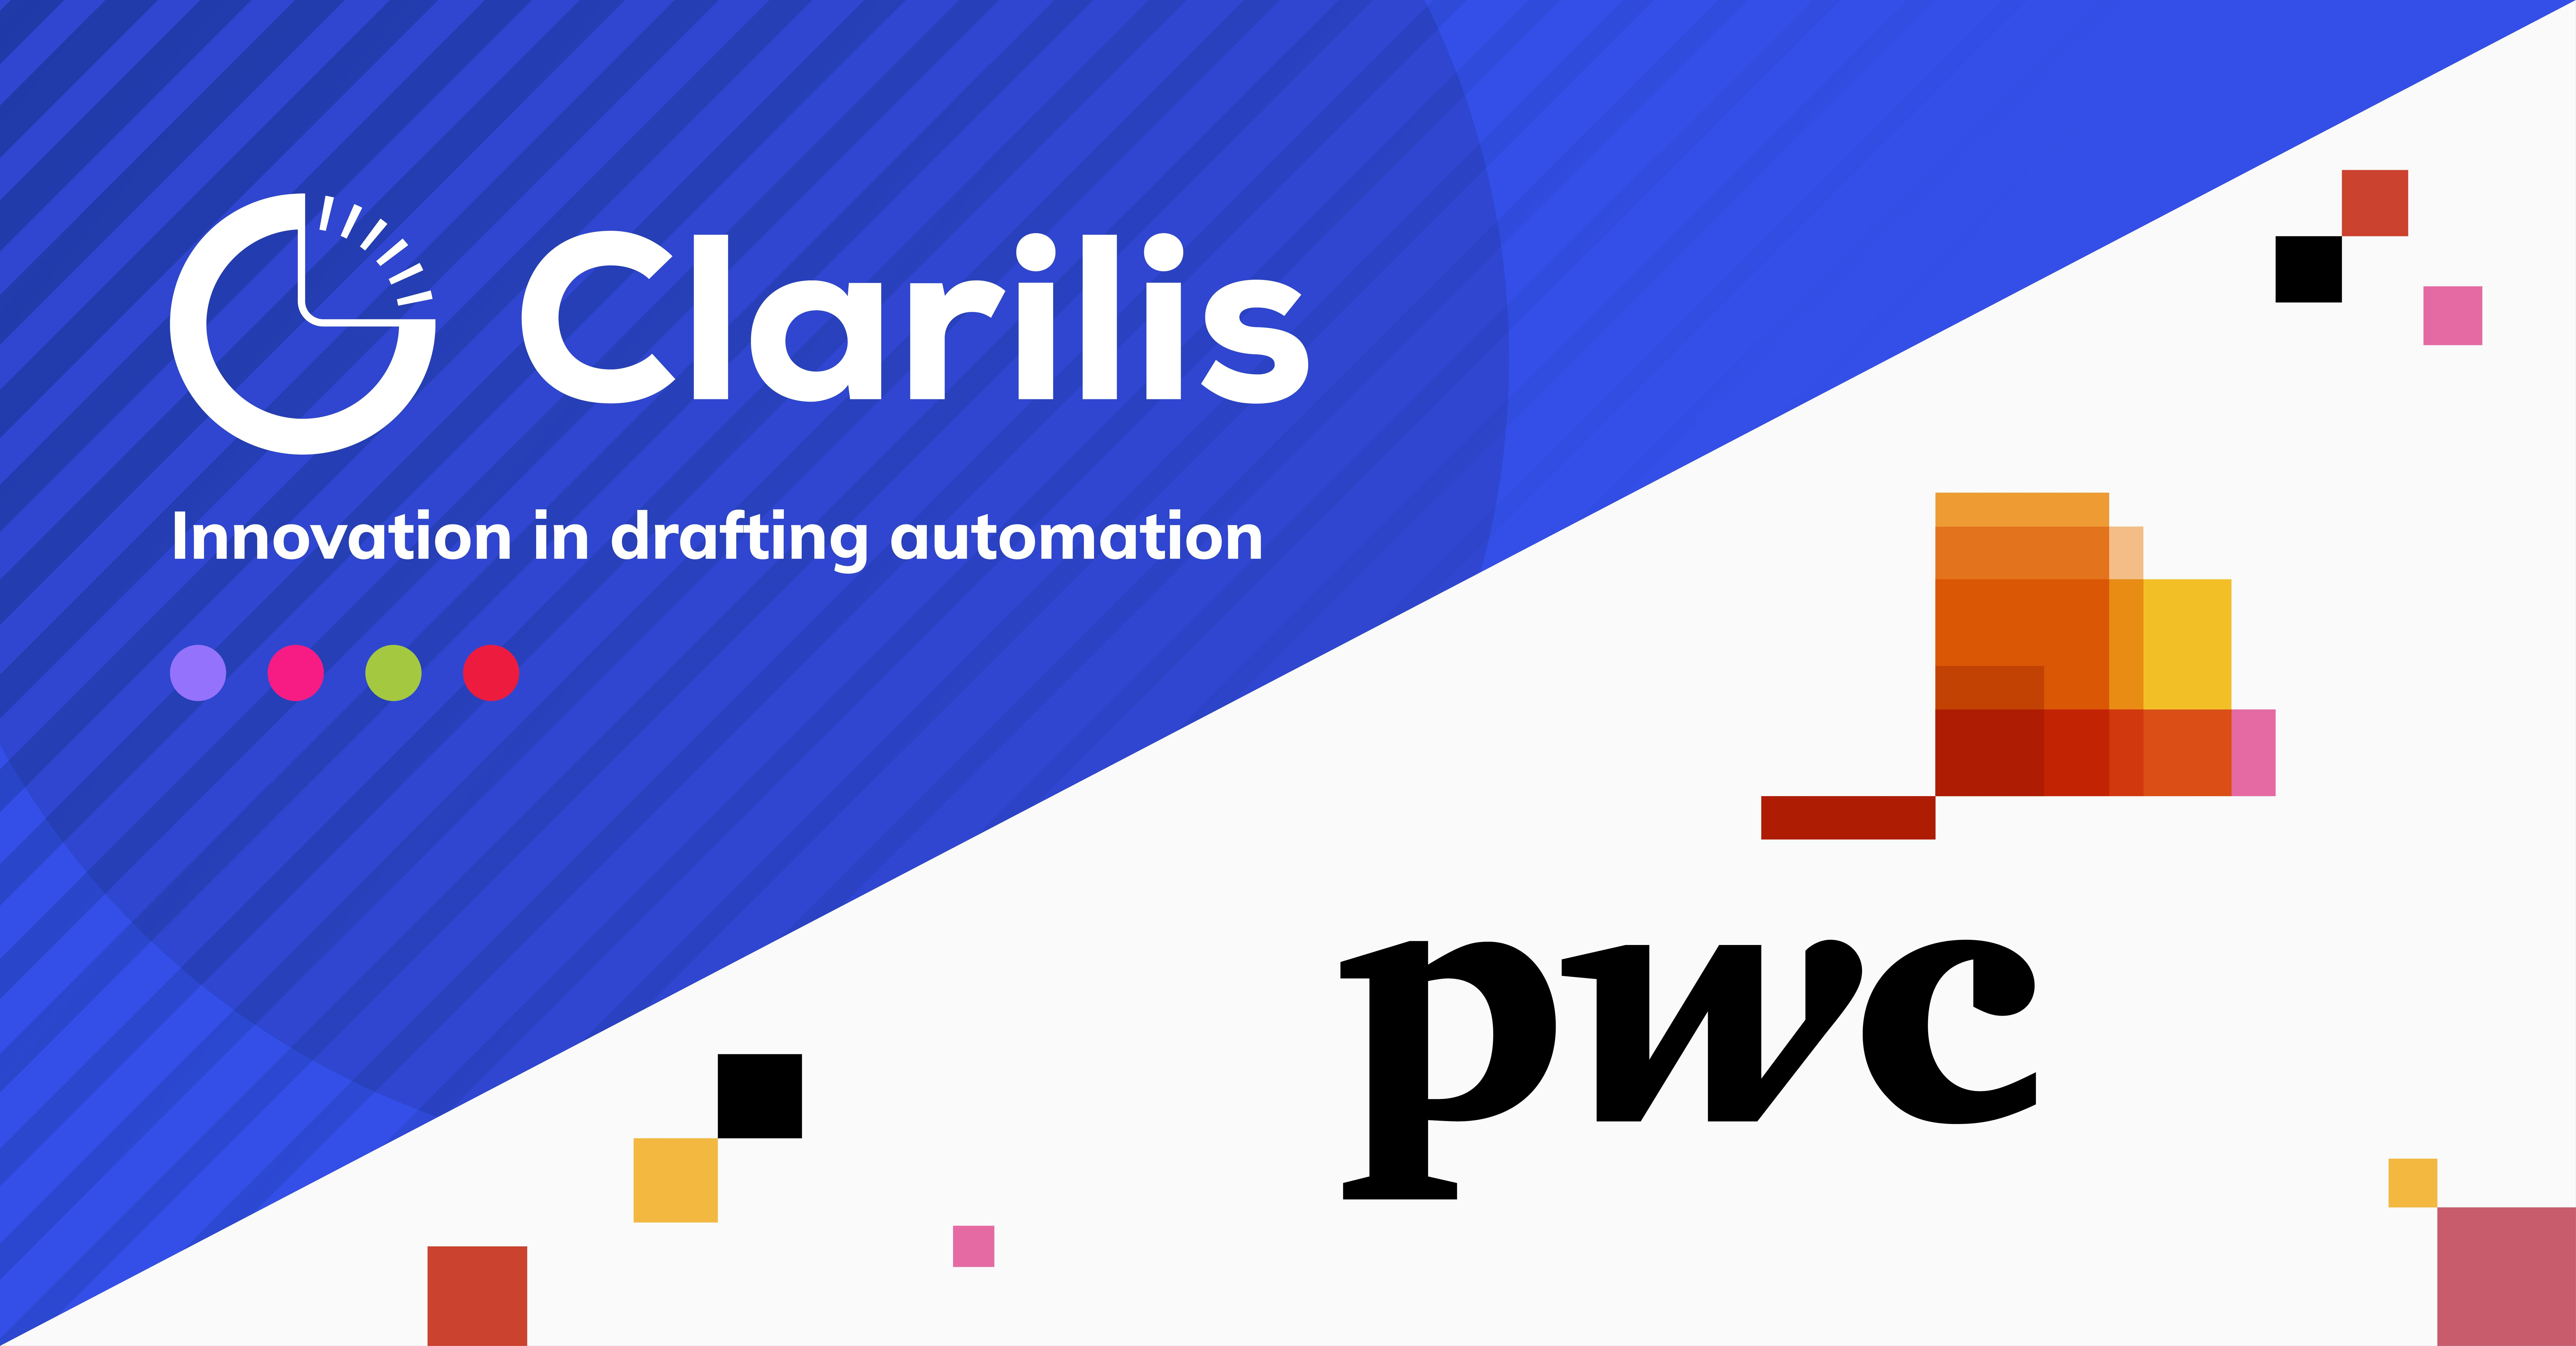 PwC and Clarilis announce new alliance